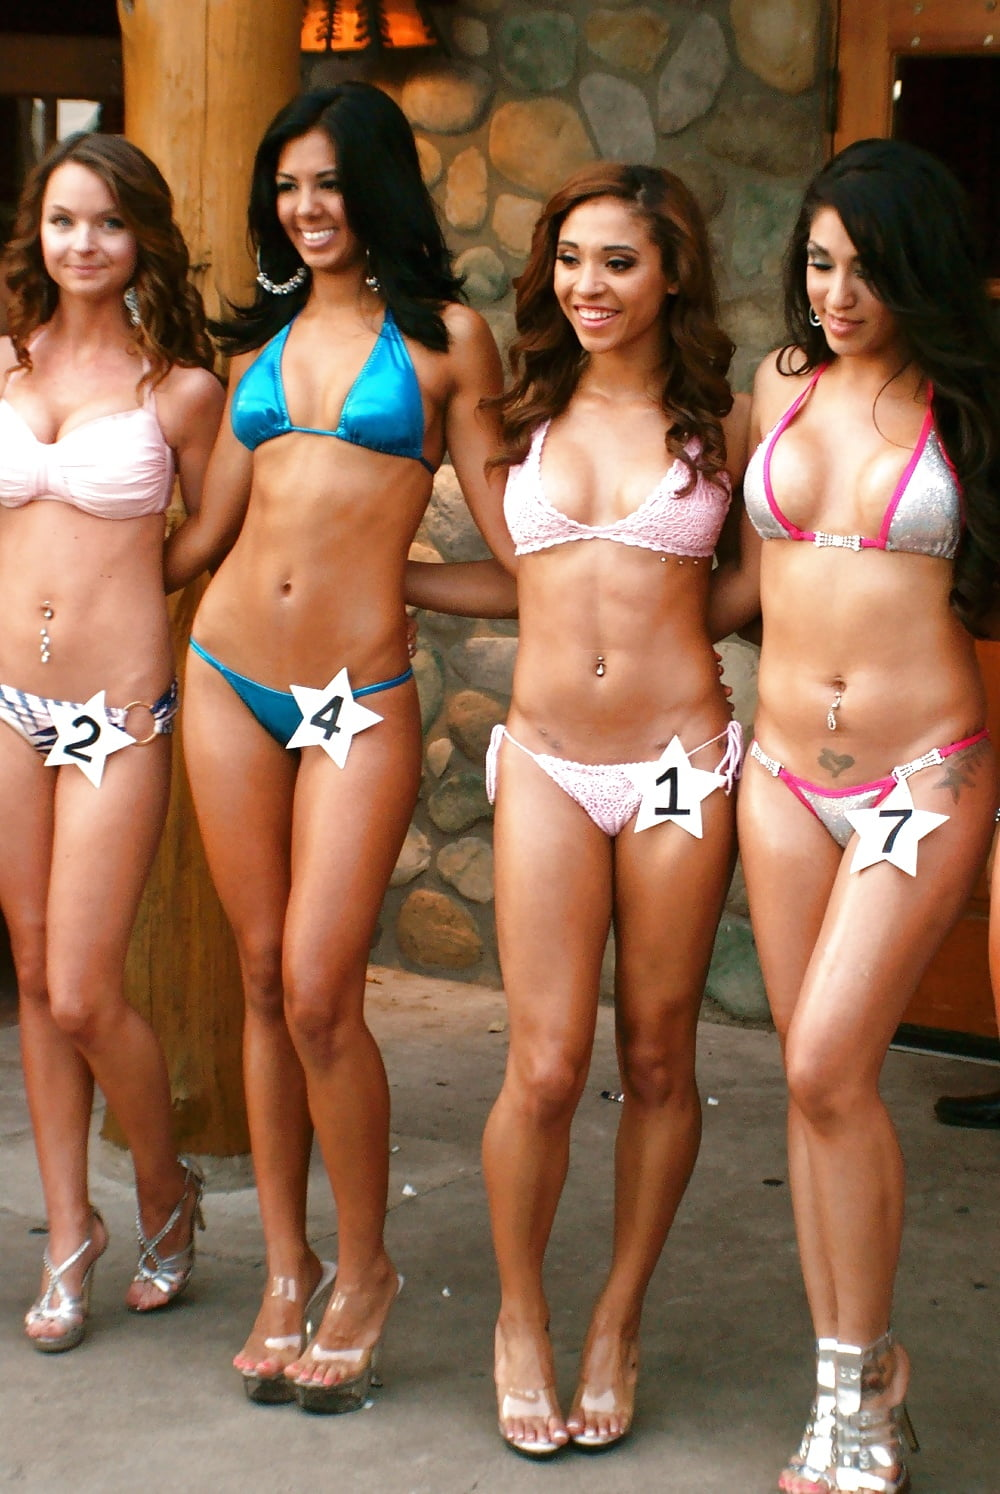 Asian bikini contests joan collins